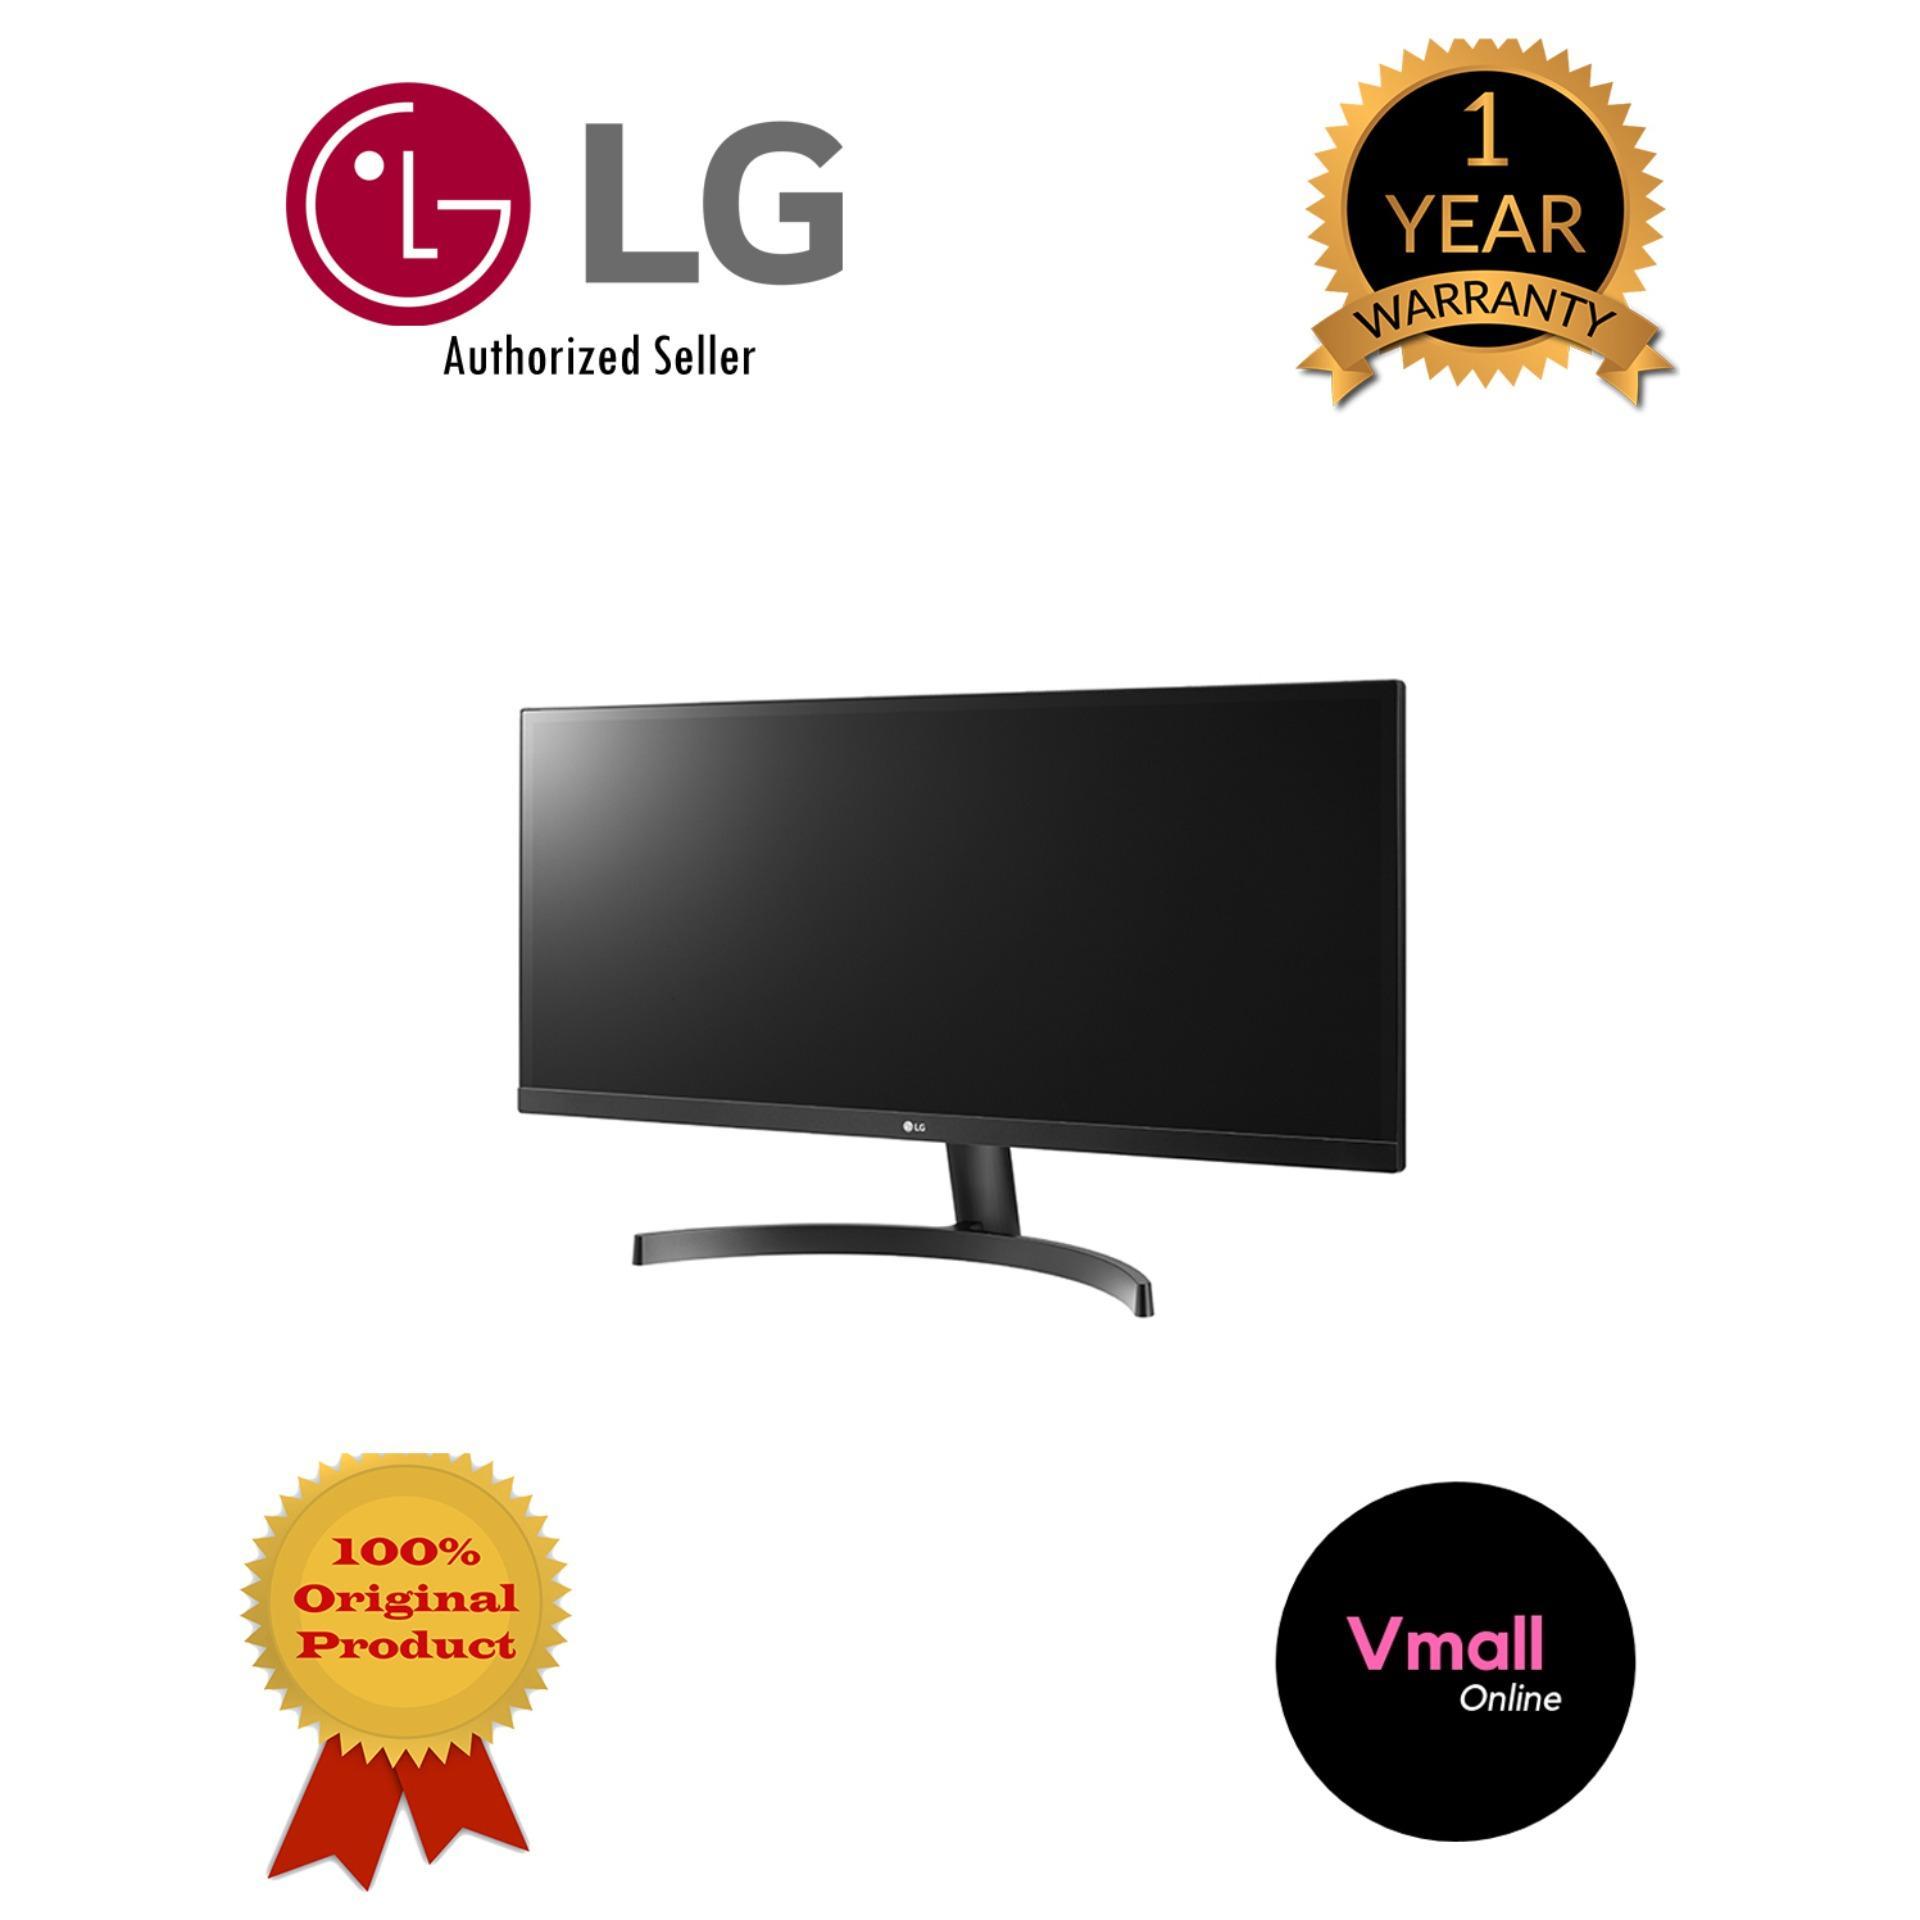 LG 29 inch 29WK500-P (Latest Model) LED IPS LCD Monitor Dual HDMI UltraWide  21:9 AMD FreeSync Screen Split 2 0 - Black